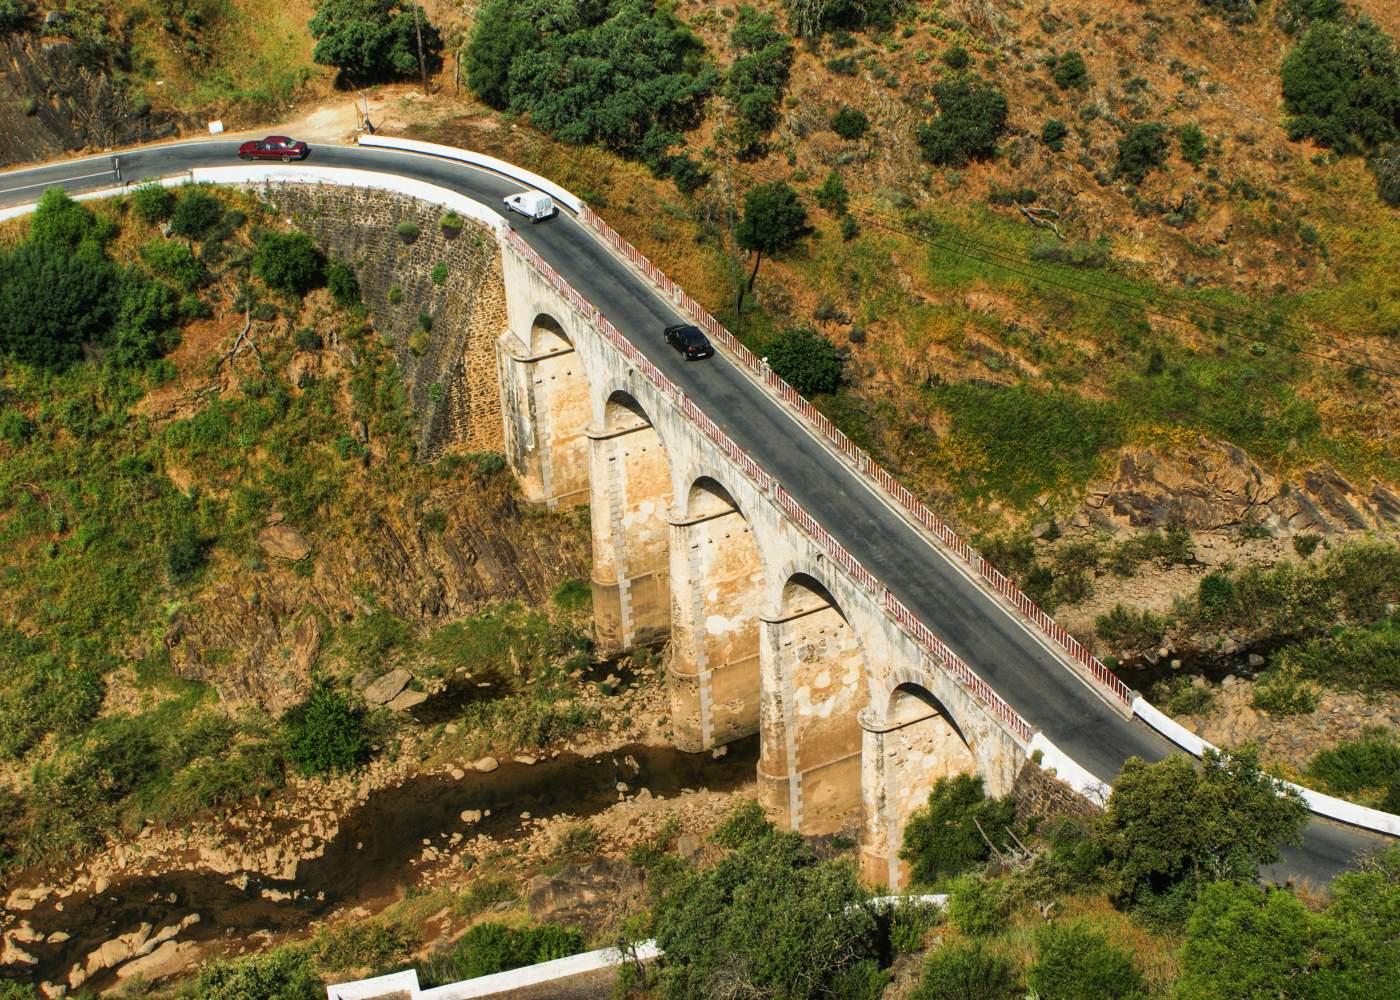 Ponte antiga de Mértola